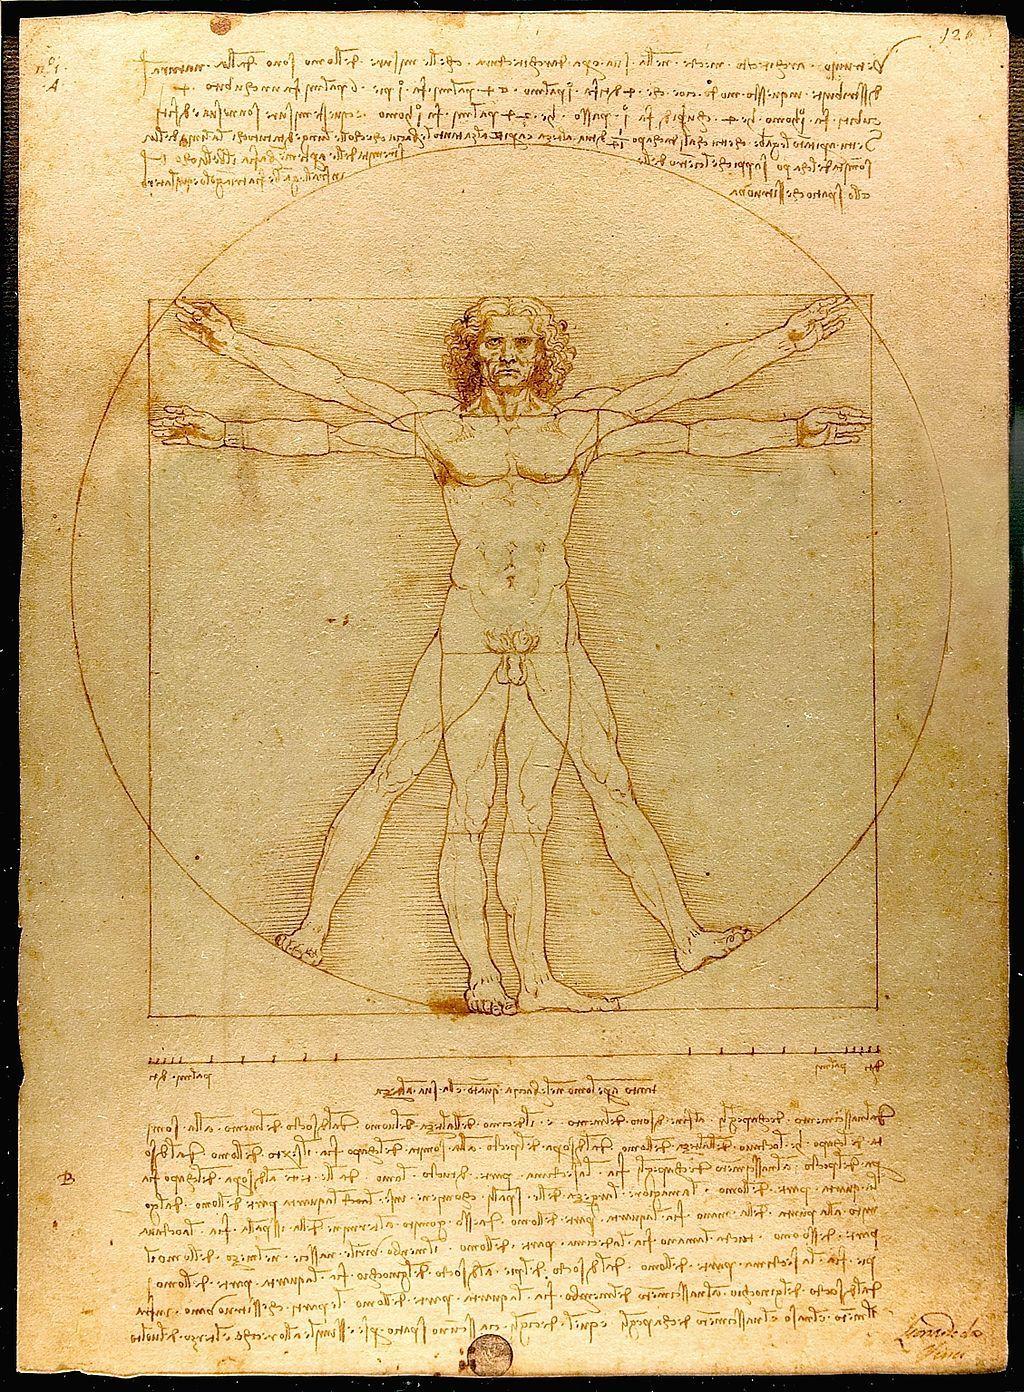 Da Vinci Vitruve Luc Viatour - Leonardo da Vinci - Wikipedia, the ...